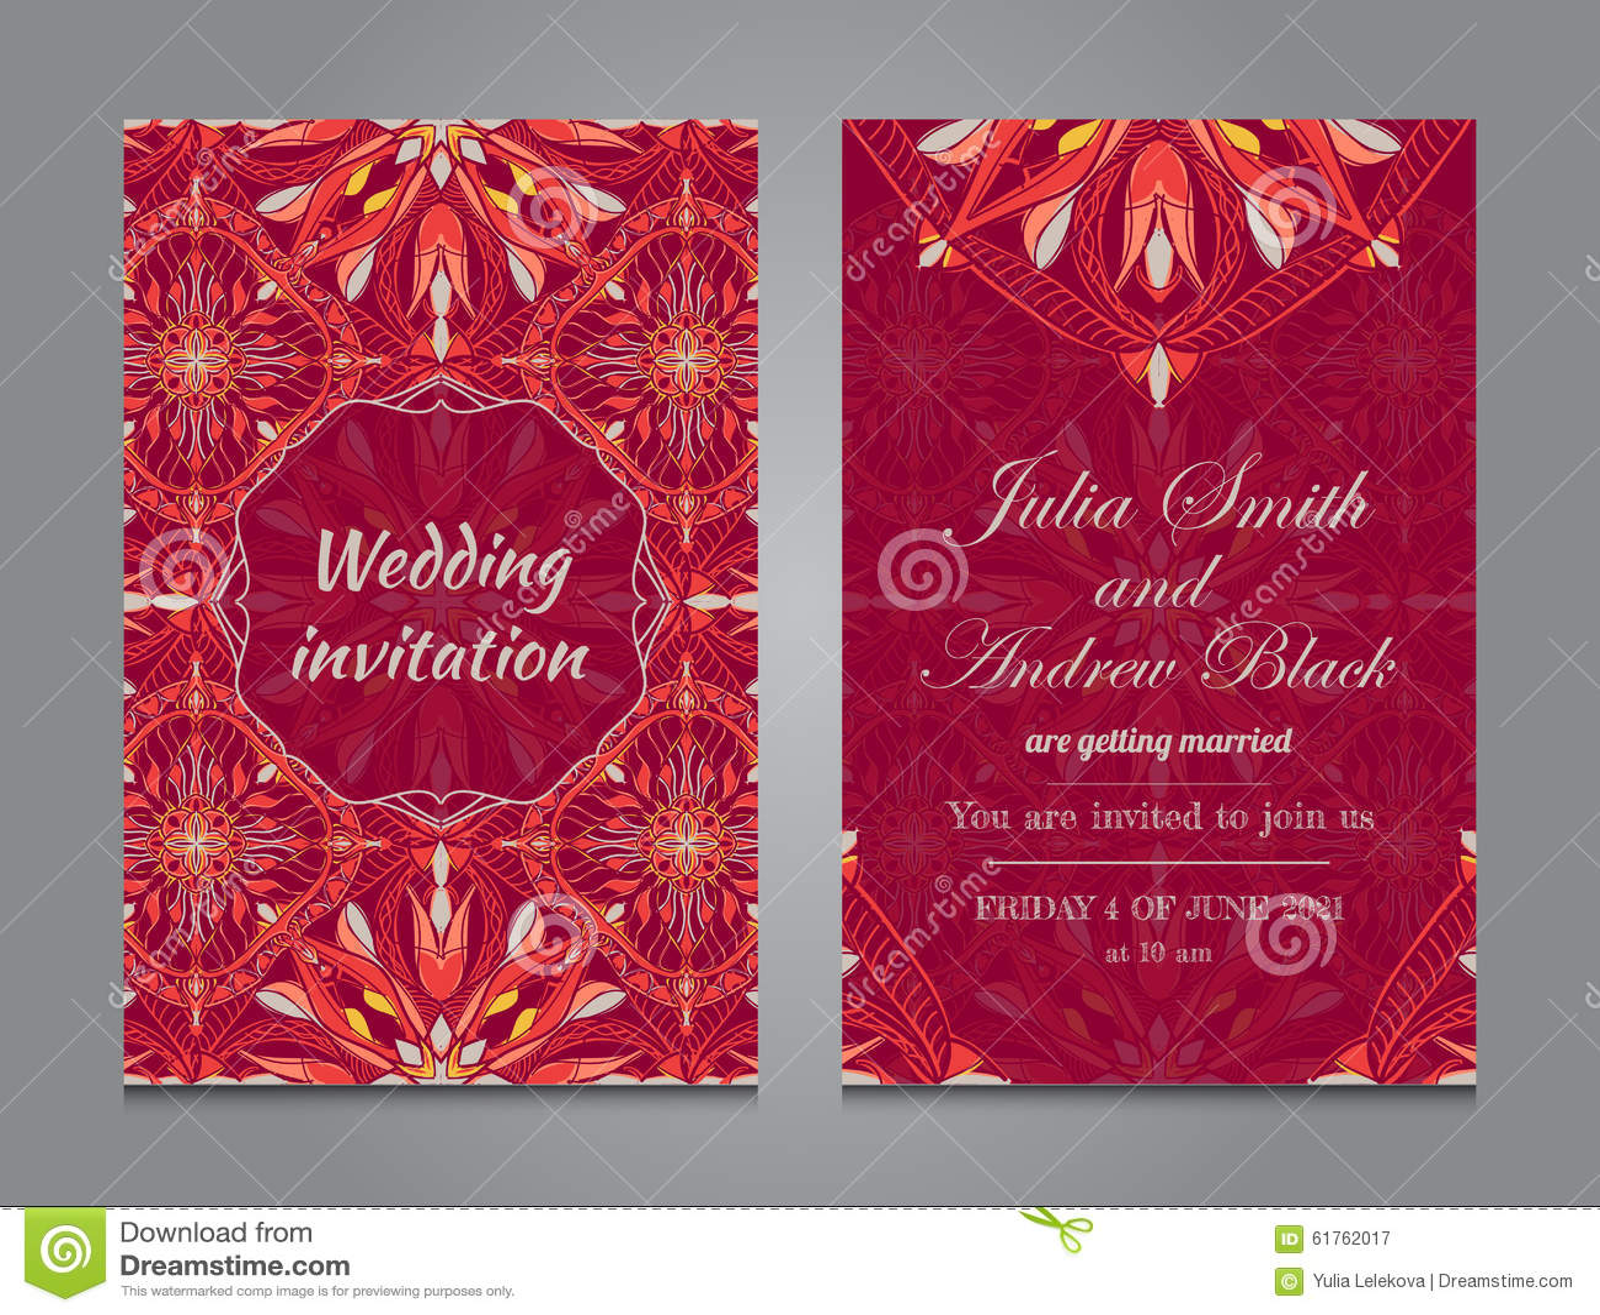 Wedding Invitation In Vintage Ornamental Style Stock Vector ...